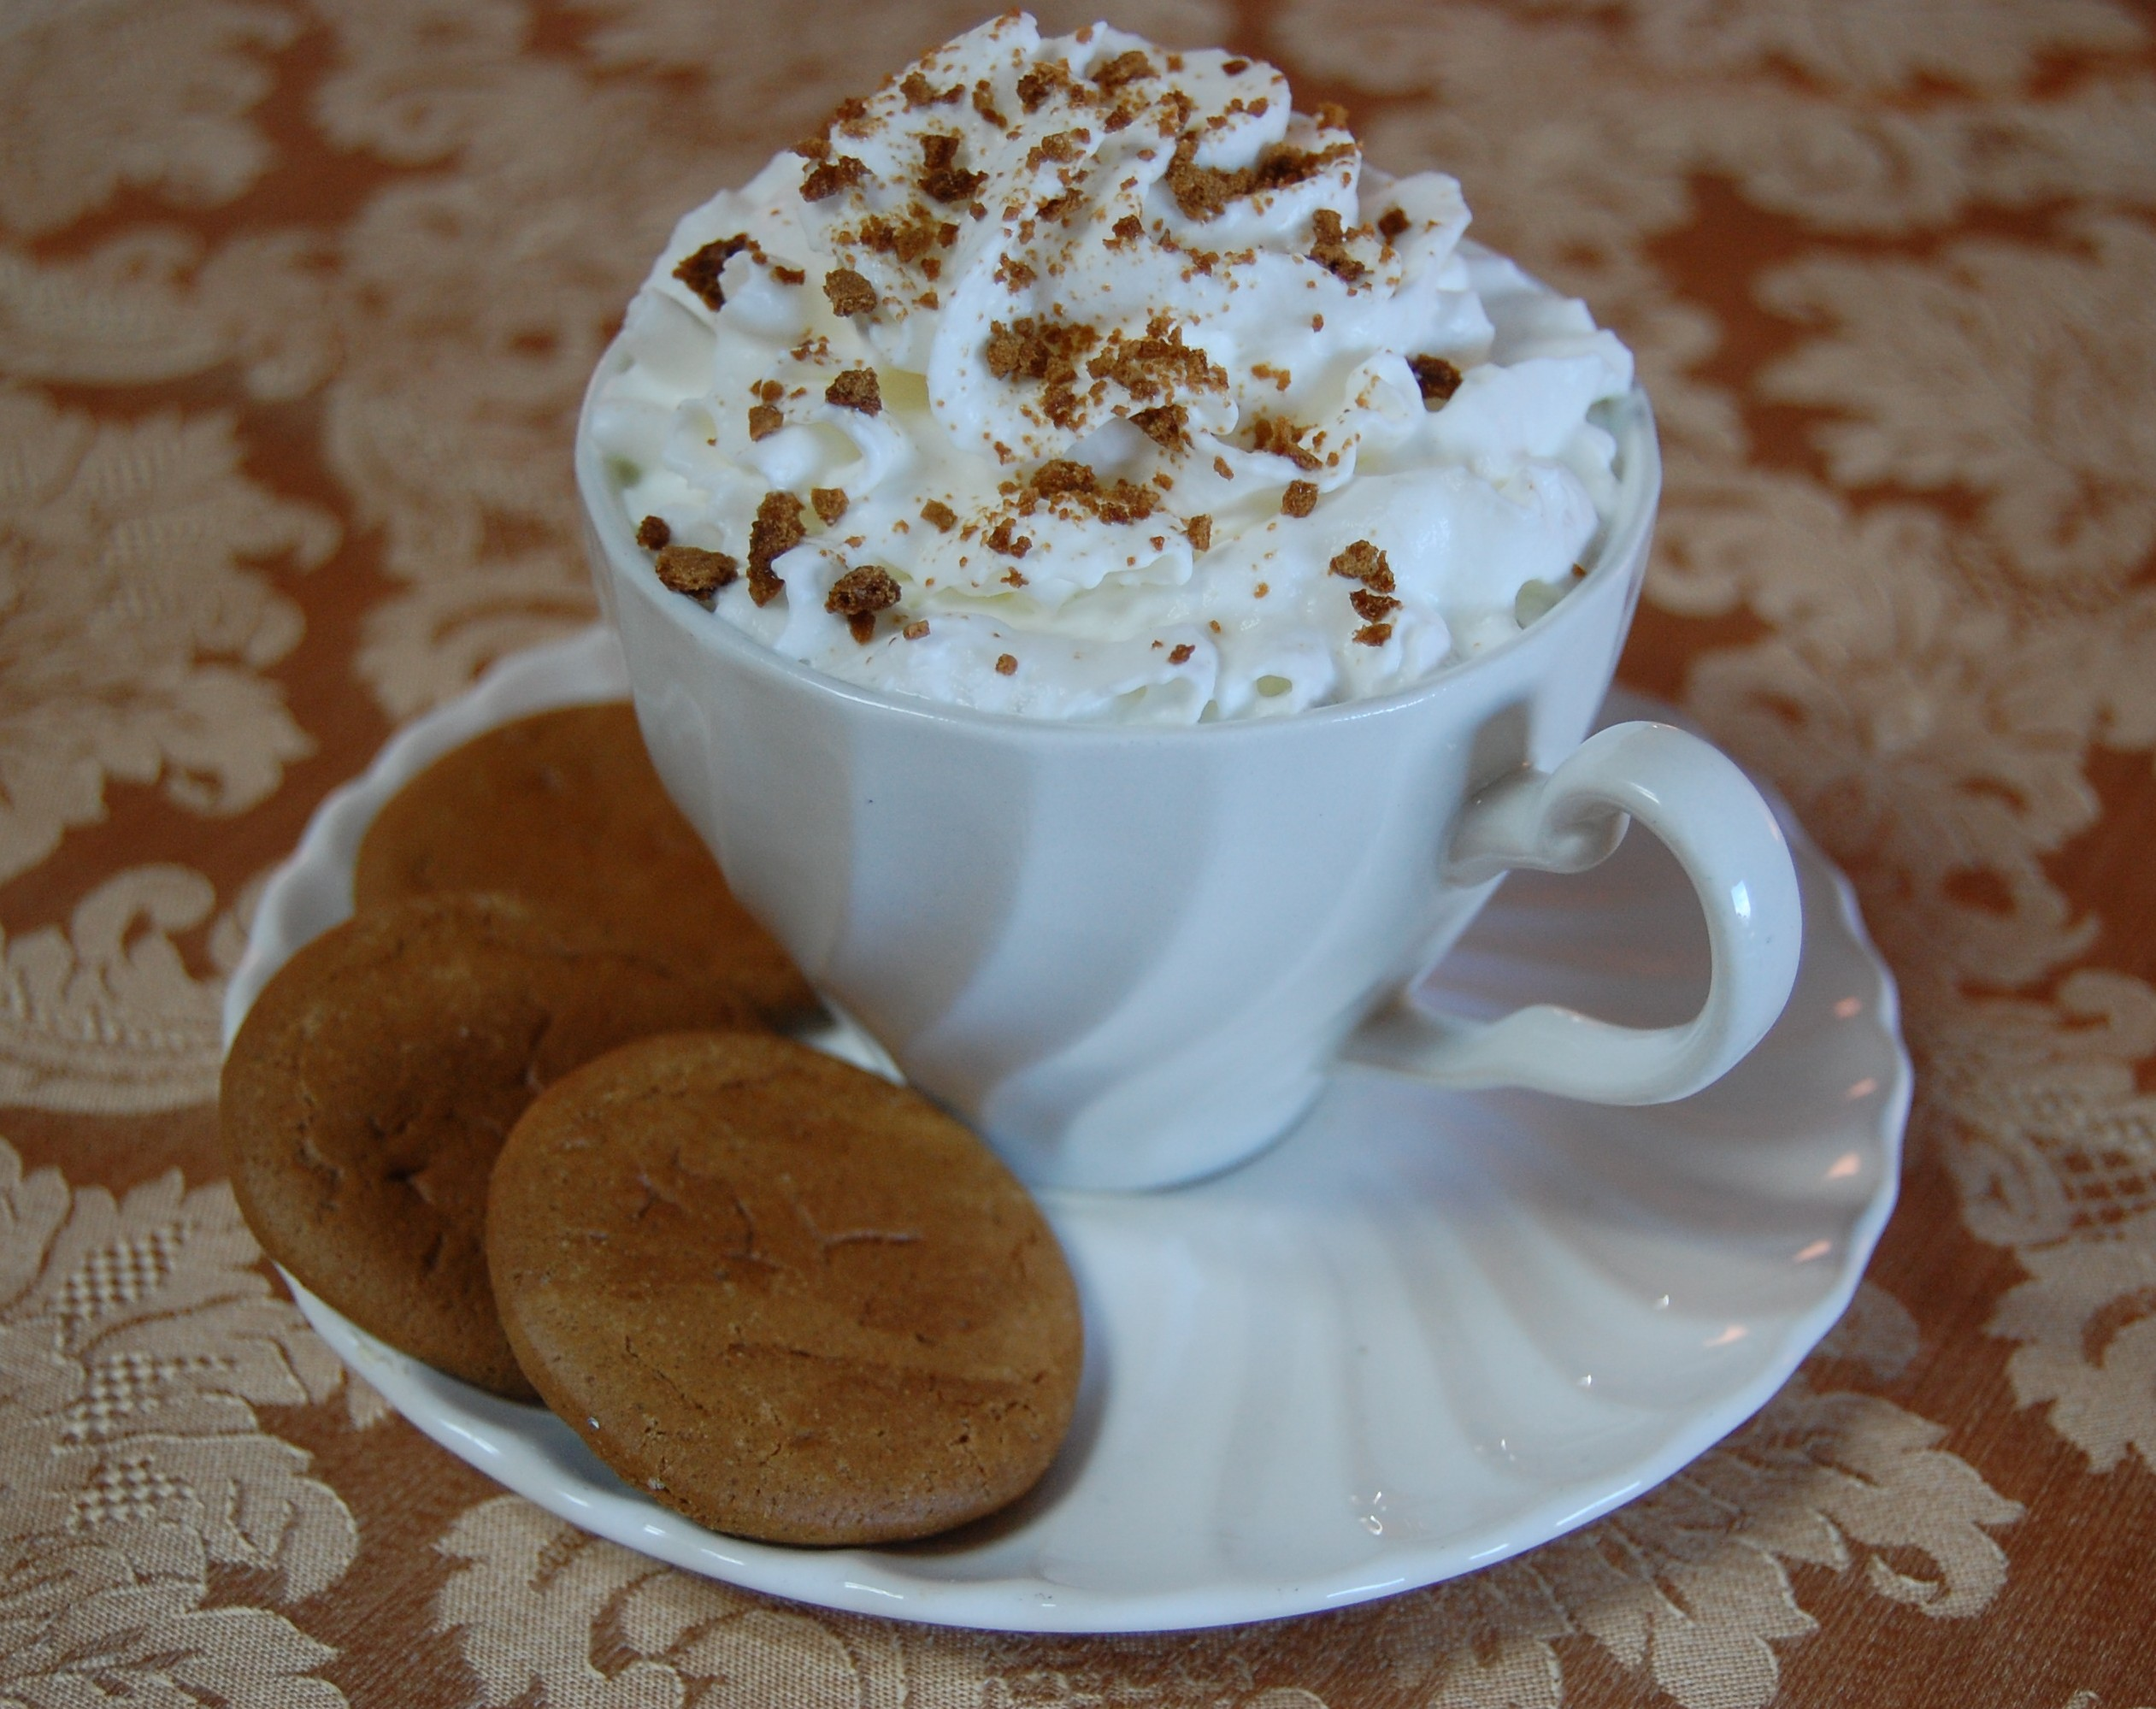 ... chocolate oat bars chocolate almond joy bars easy hot chocolate bar at